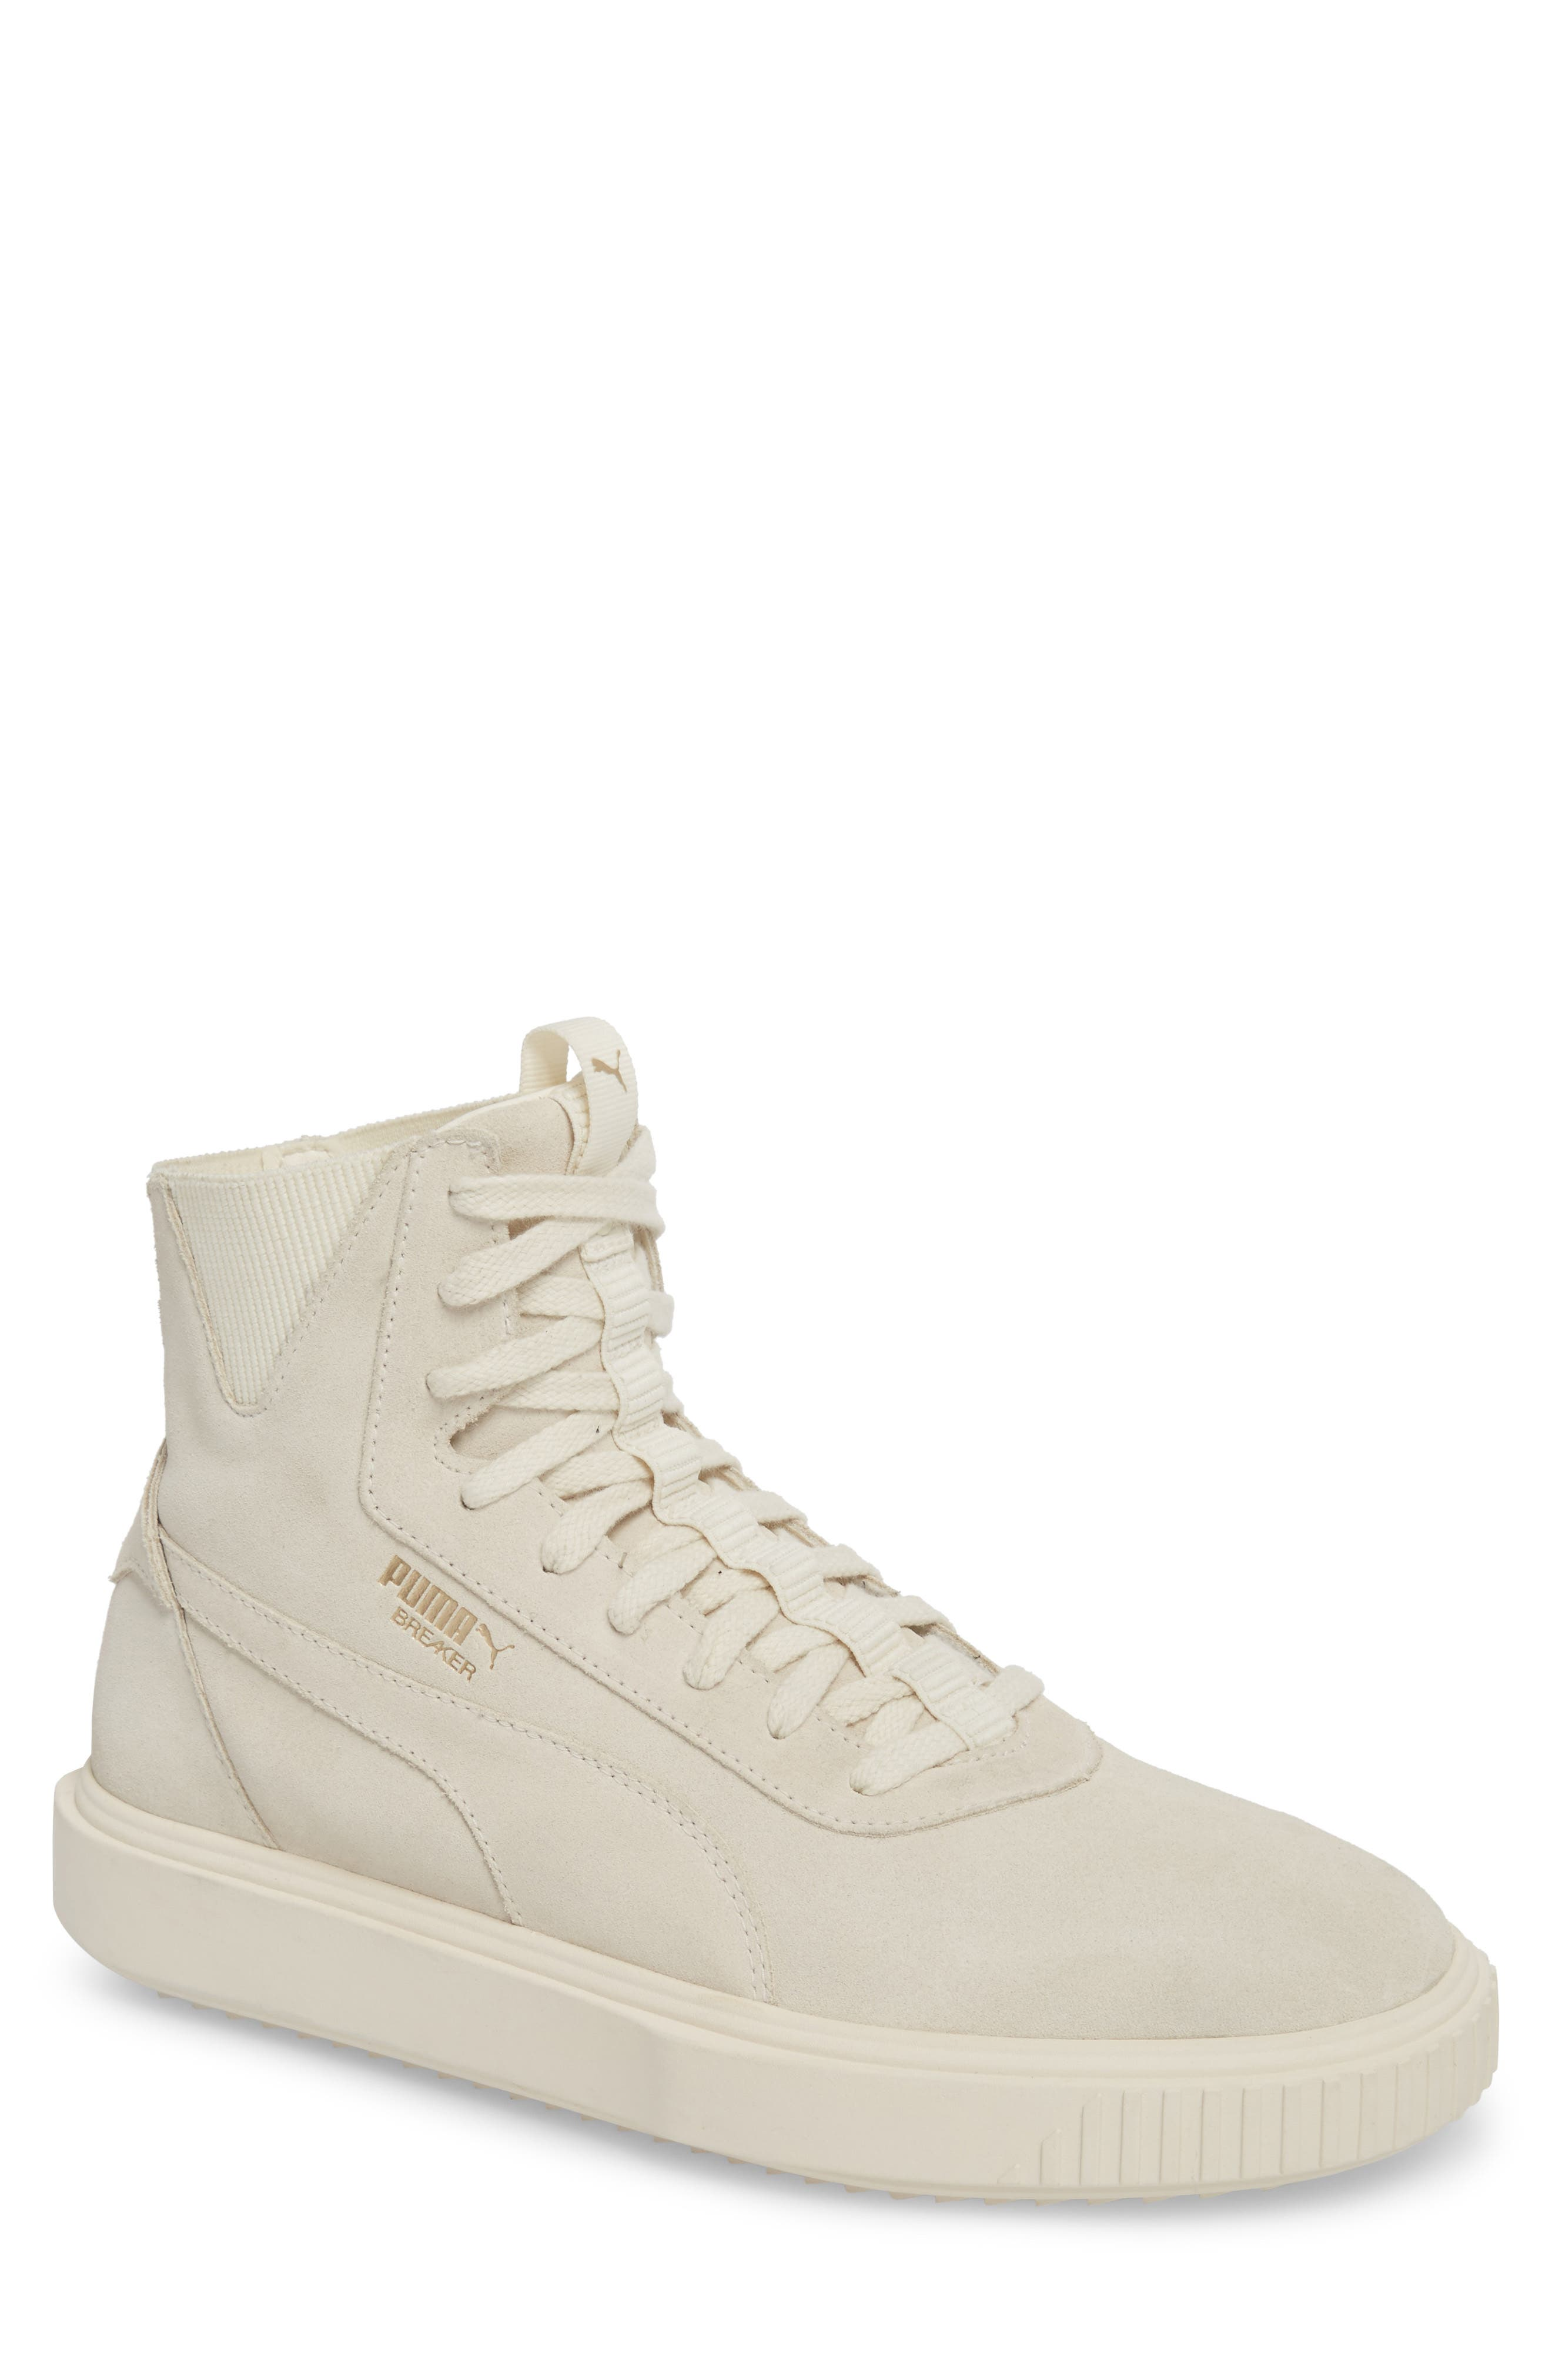 Breaker High Top Sneaker,                             Main thumbnail 1, color,                             WHITE